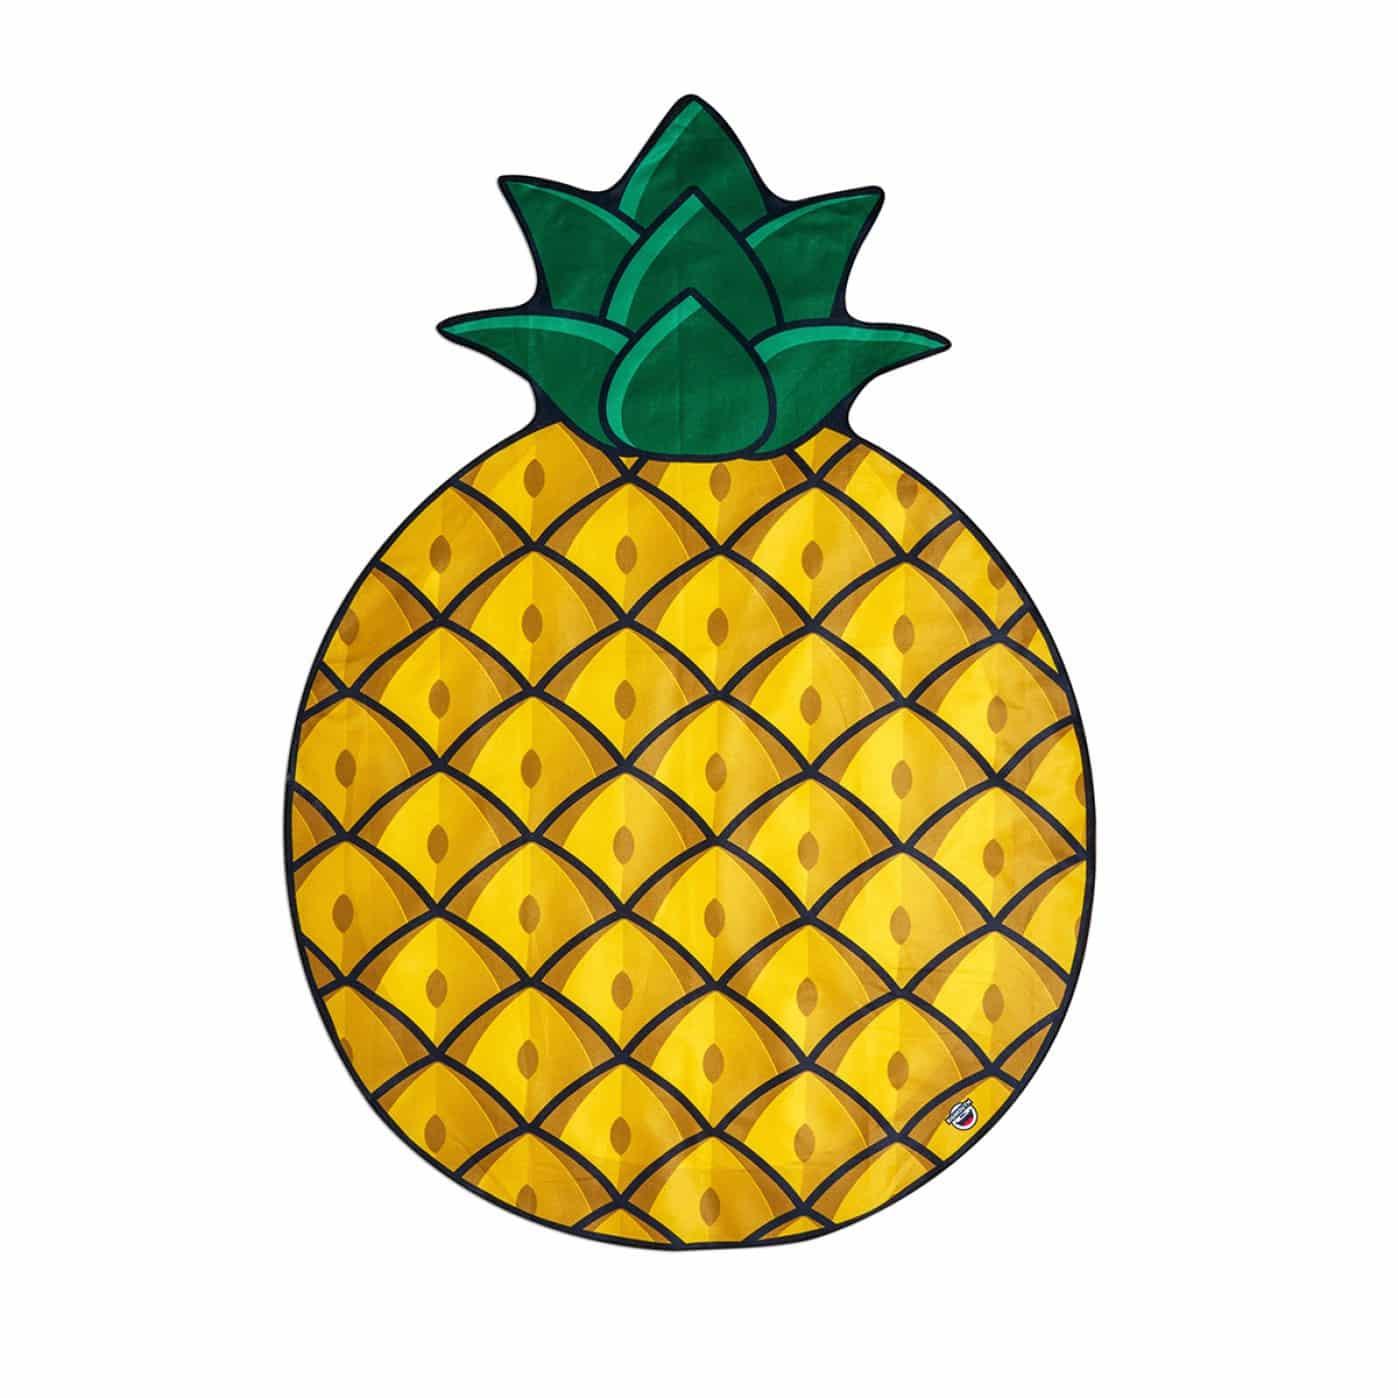 Serviette de plage ananas xxl super insolite - Serviette de plage splash ...